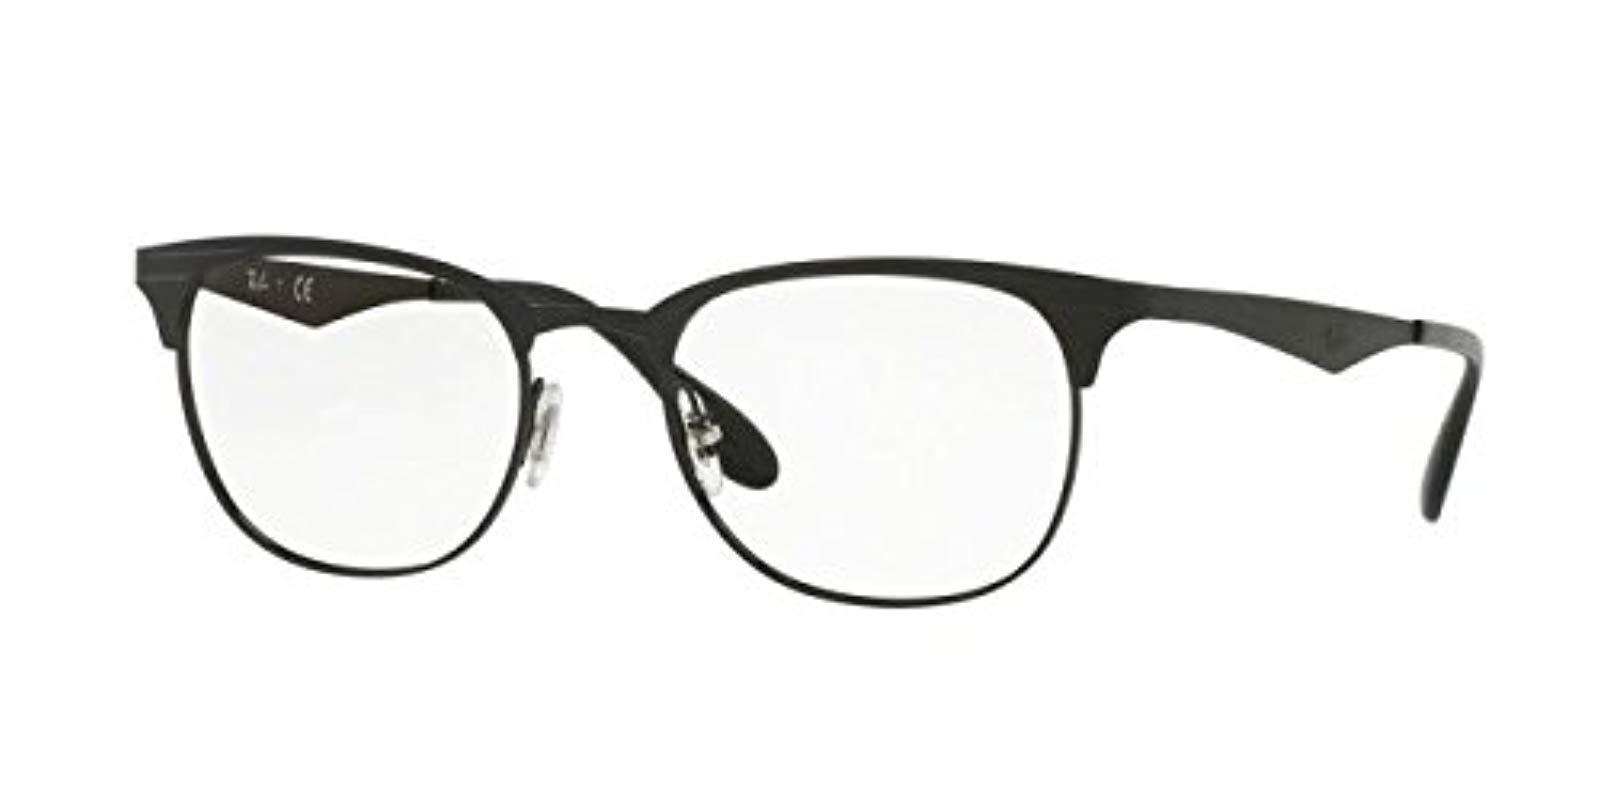 b3118175e364f Lyst - Ray-Ban 0rx6346 No Polarization Square Prescription Eyewear ...